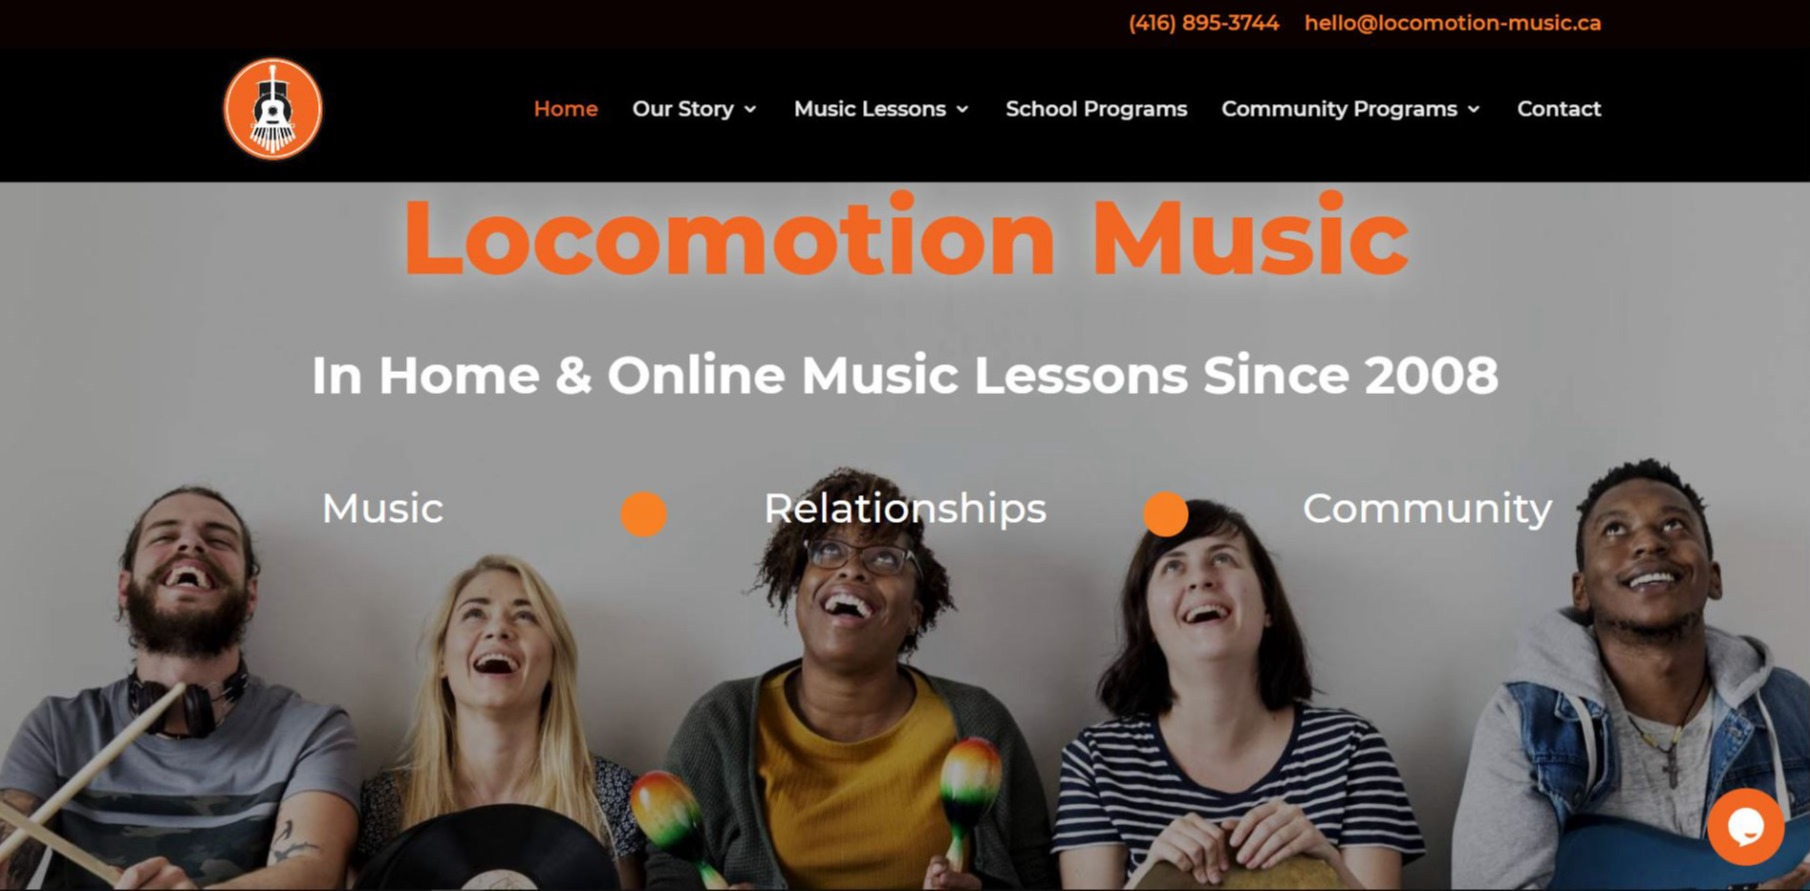 Locomotion Music Digital Marketing by Joshi Digital